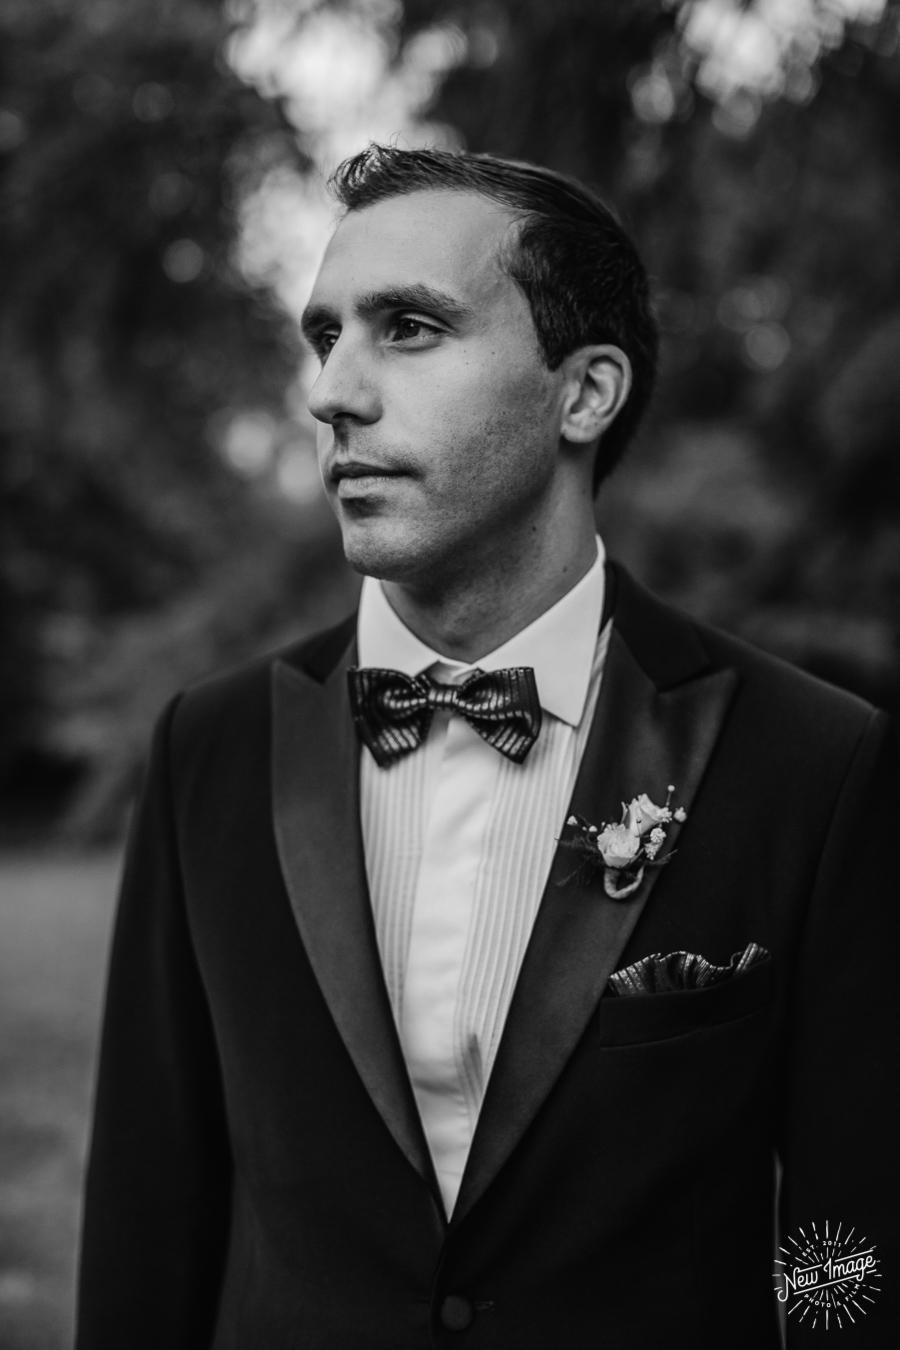 6-meli-edu-casamiento-boda-new-image-la-quinta-de-bella-vista-fotografia-video-cinematografia-de-bodas-2